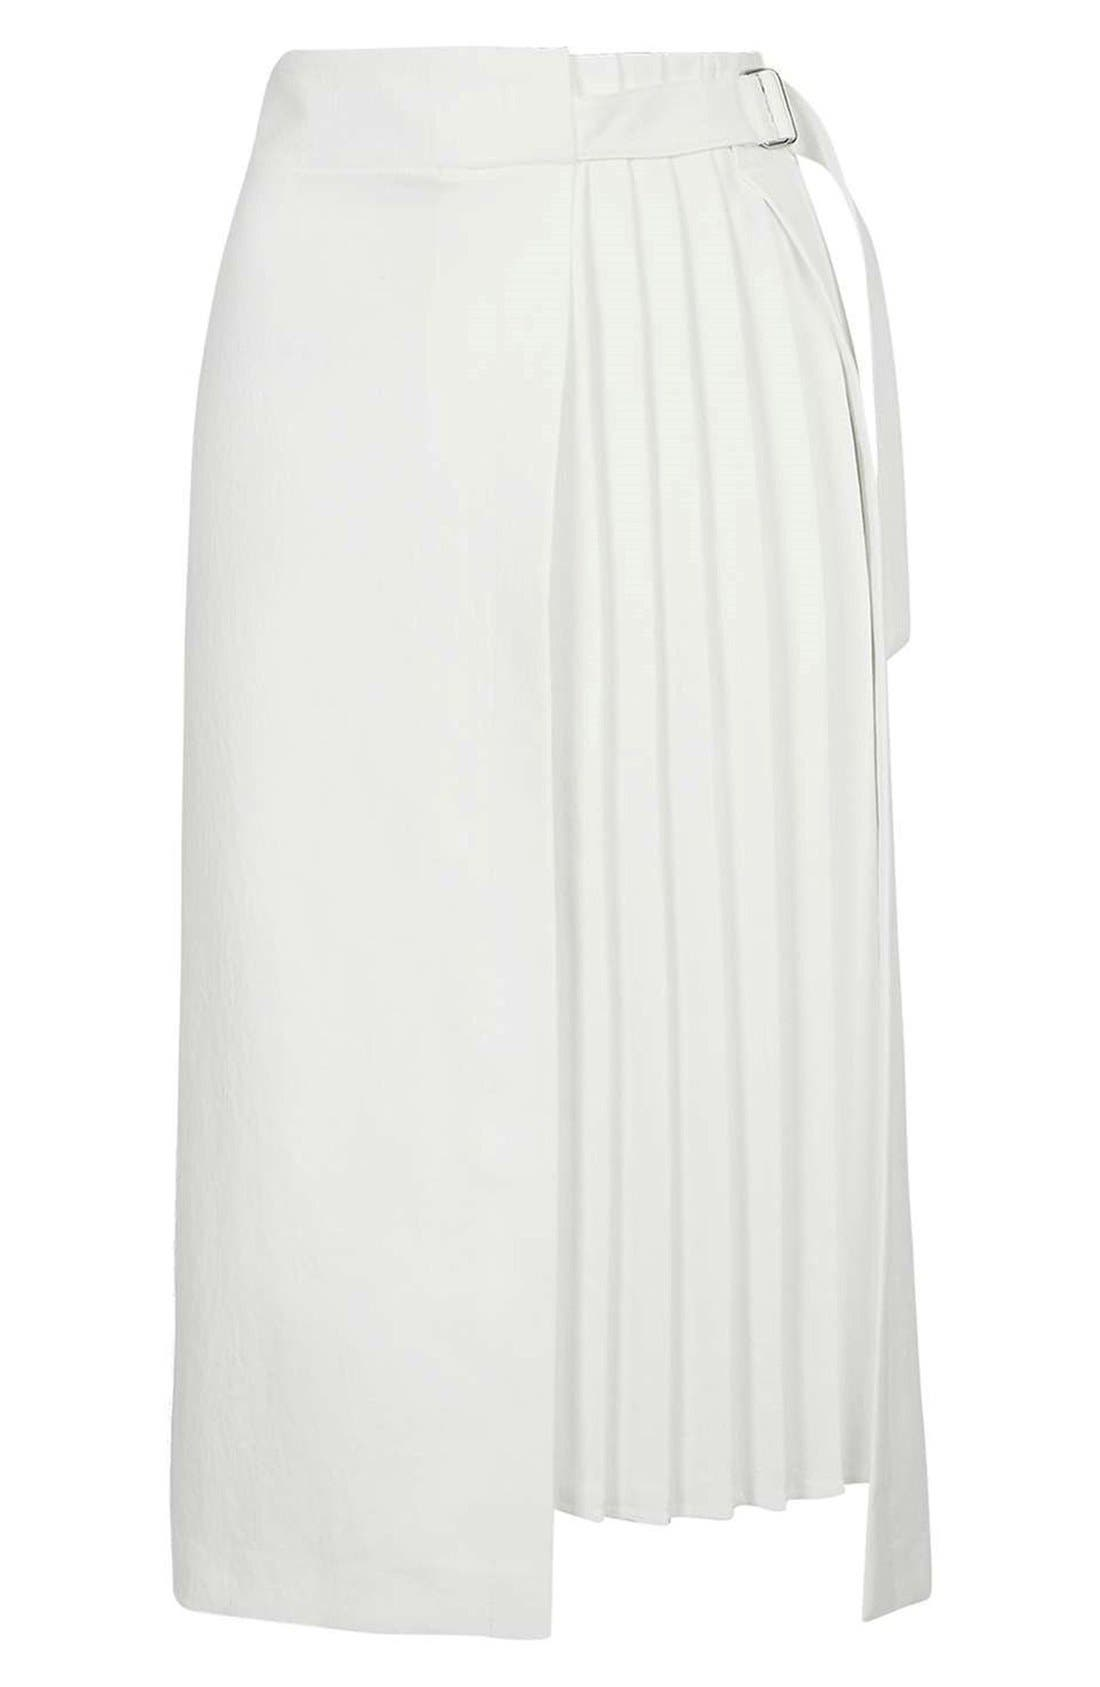 Pleat Detail Wrap Midi Skirt,                             Alternate thumbnail 2, color,                             900